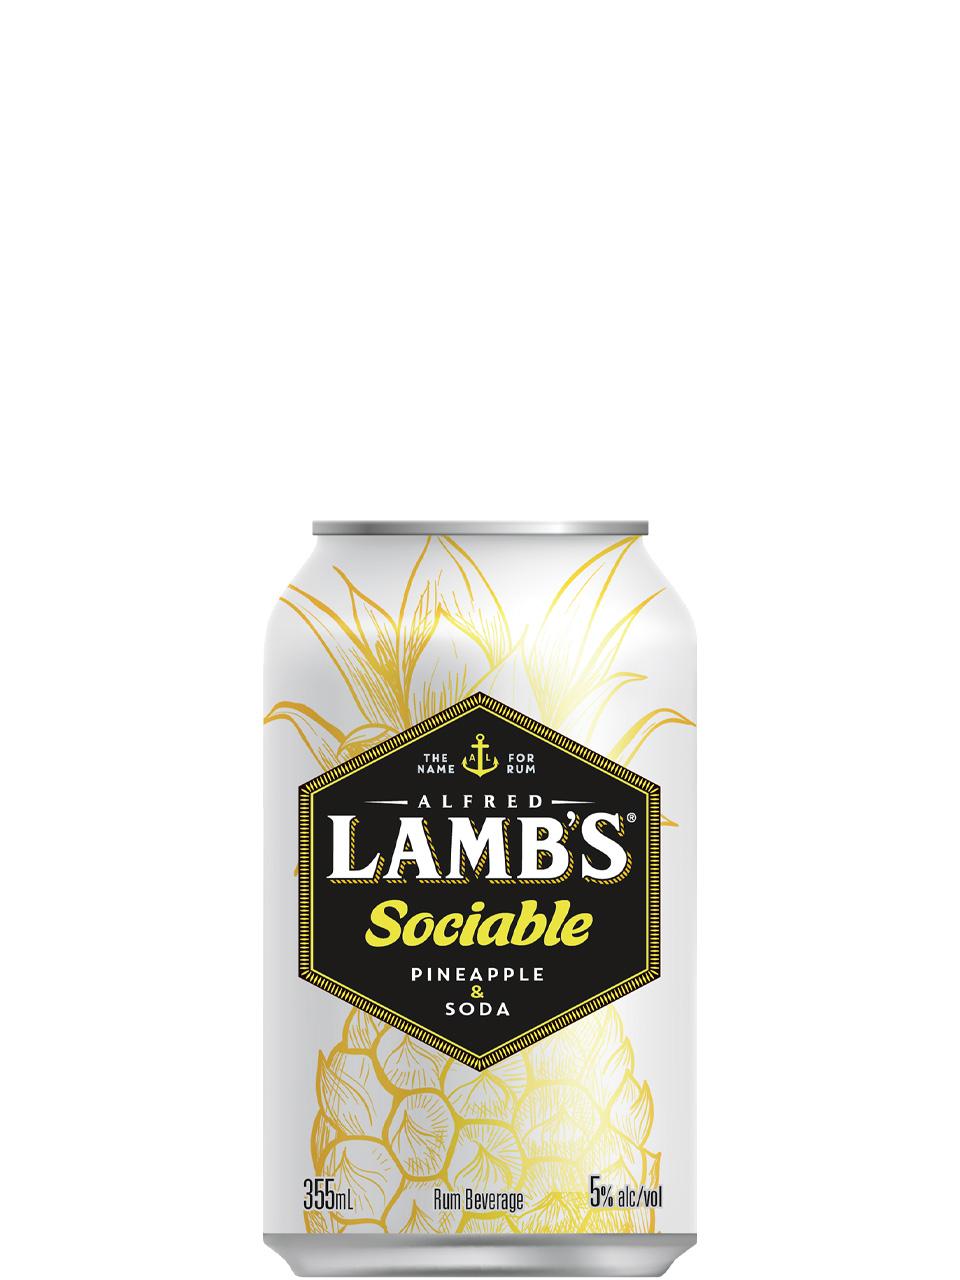 Lamb's Sociable Pineapple & Soda 6 Pack Cans